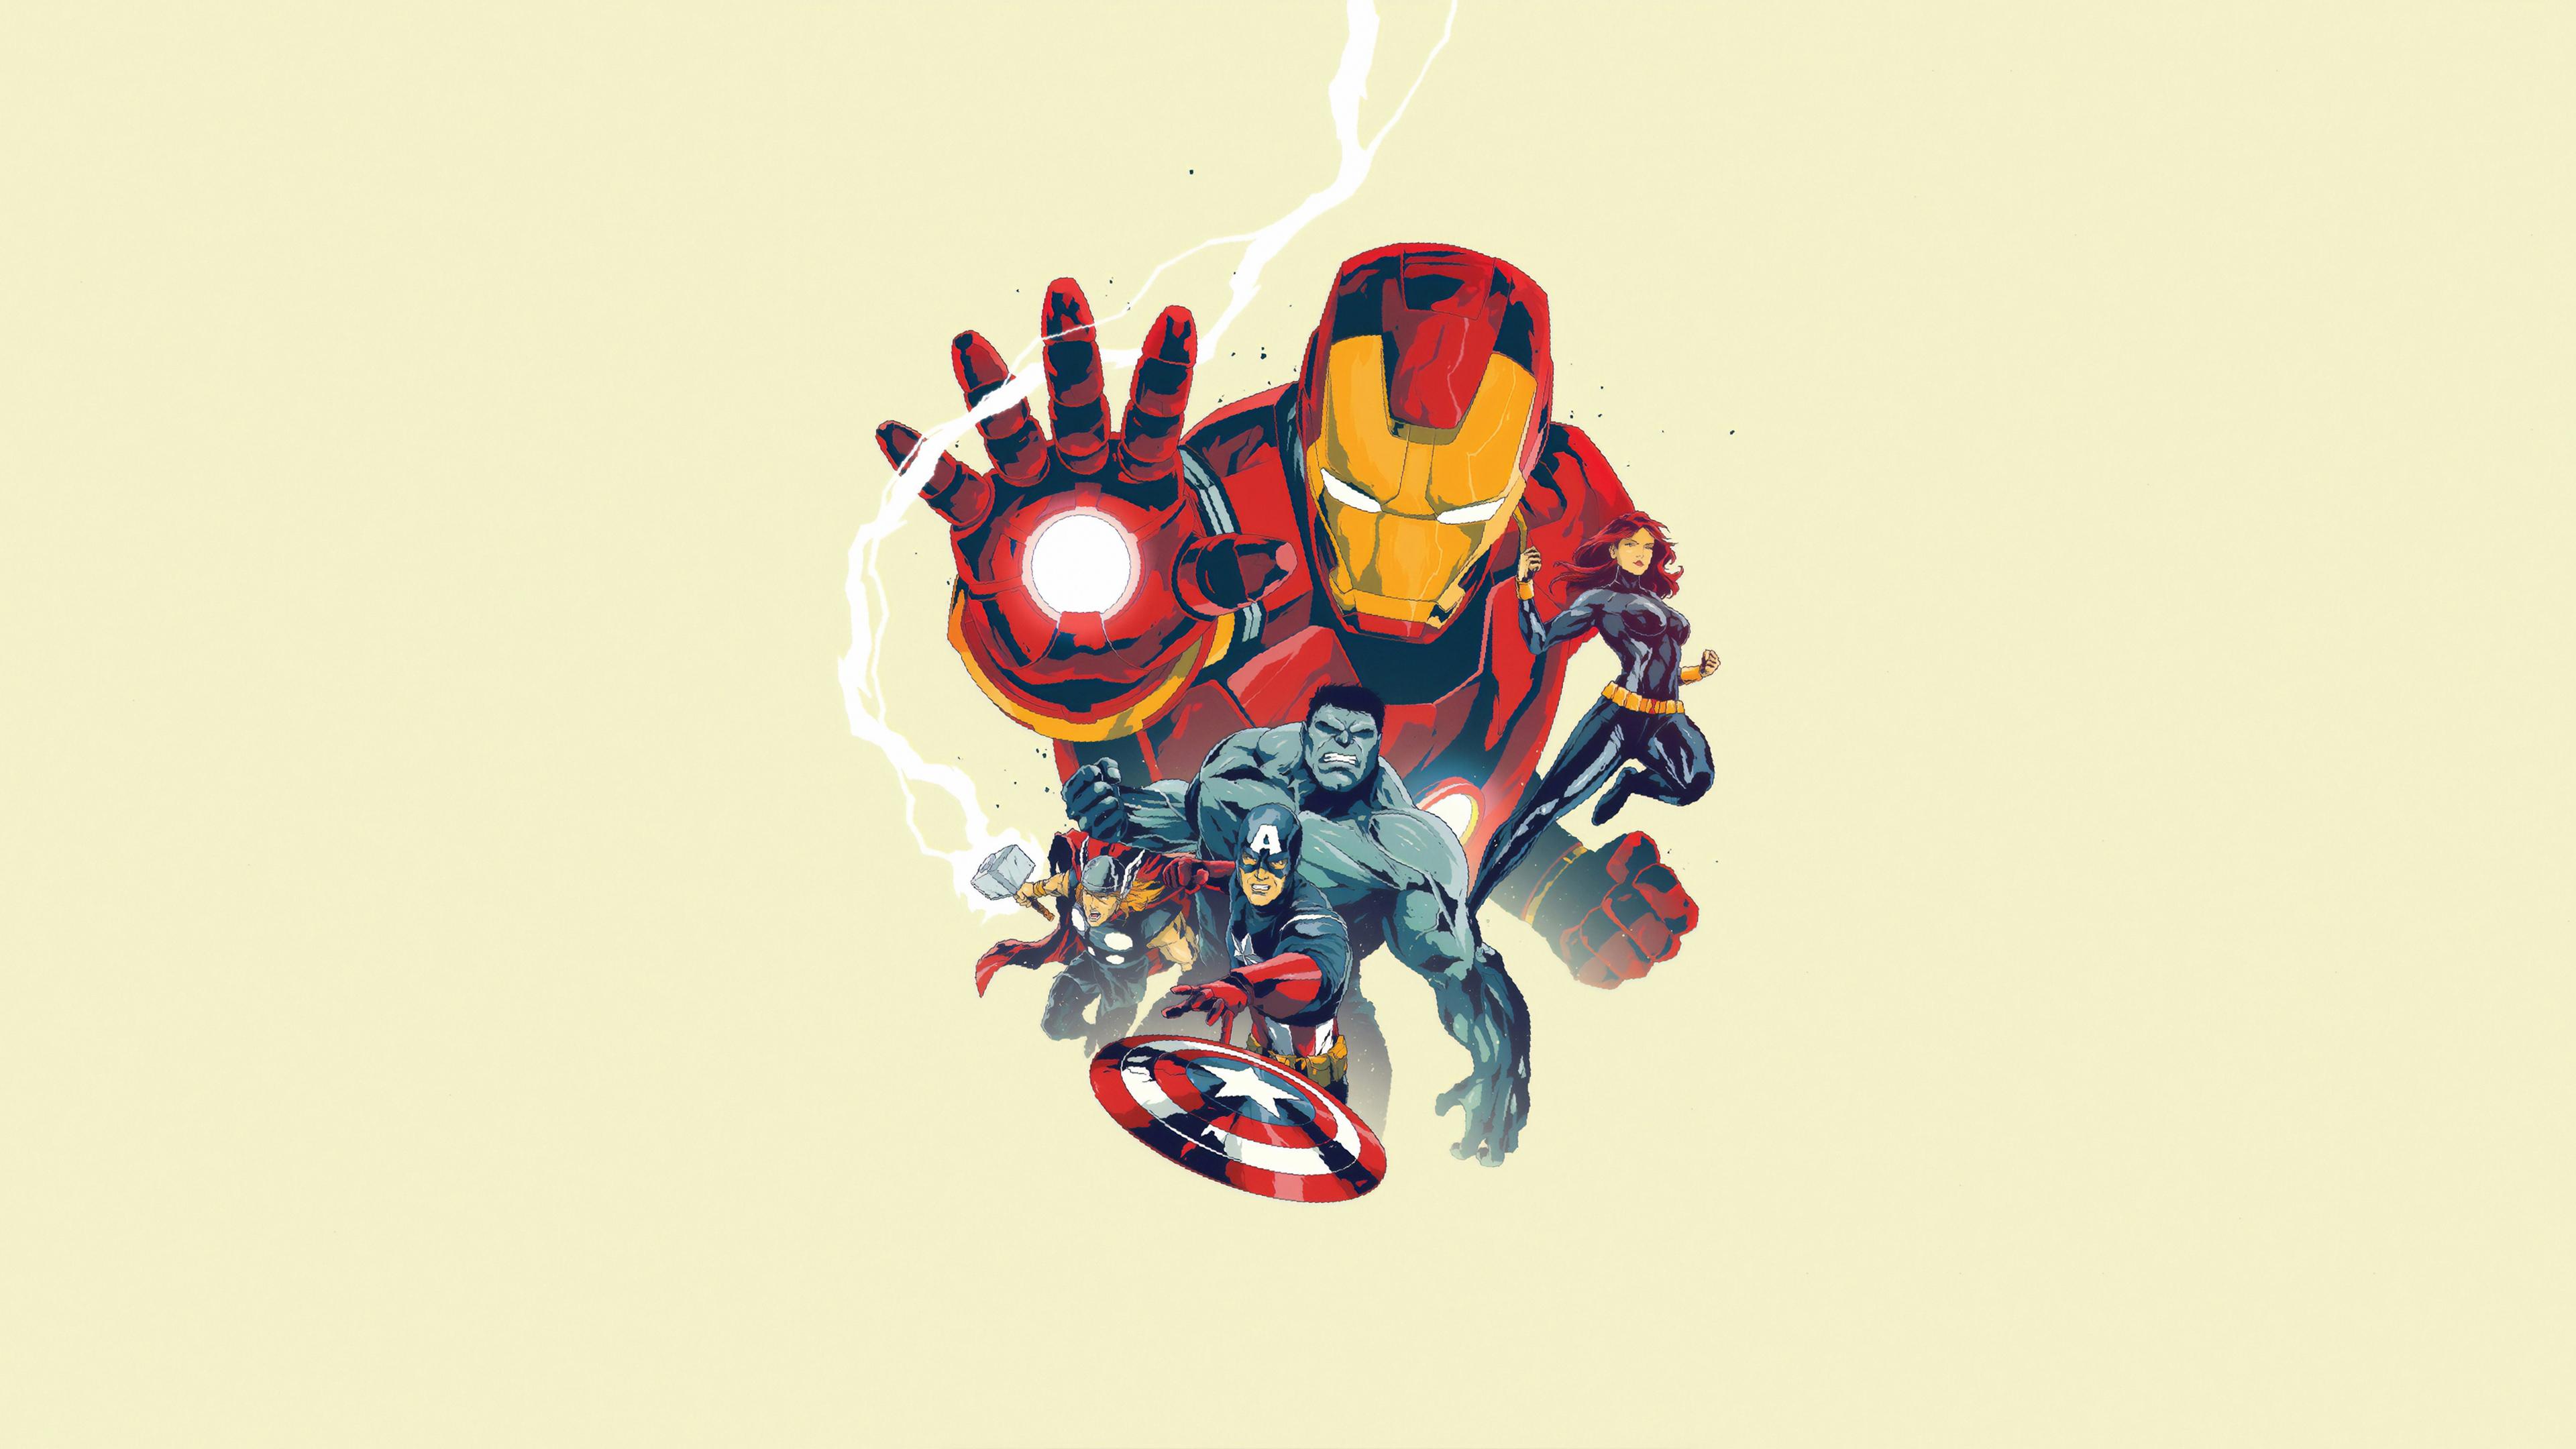 marvel heroes arts 1570918569 - Marvel Heroes Arts - superheroes wallpapers, iron man wallpapers, hd-wallpapers, artwork wallpapers, 4k-wallpapers